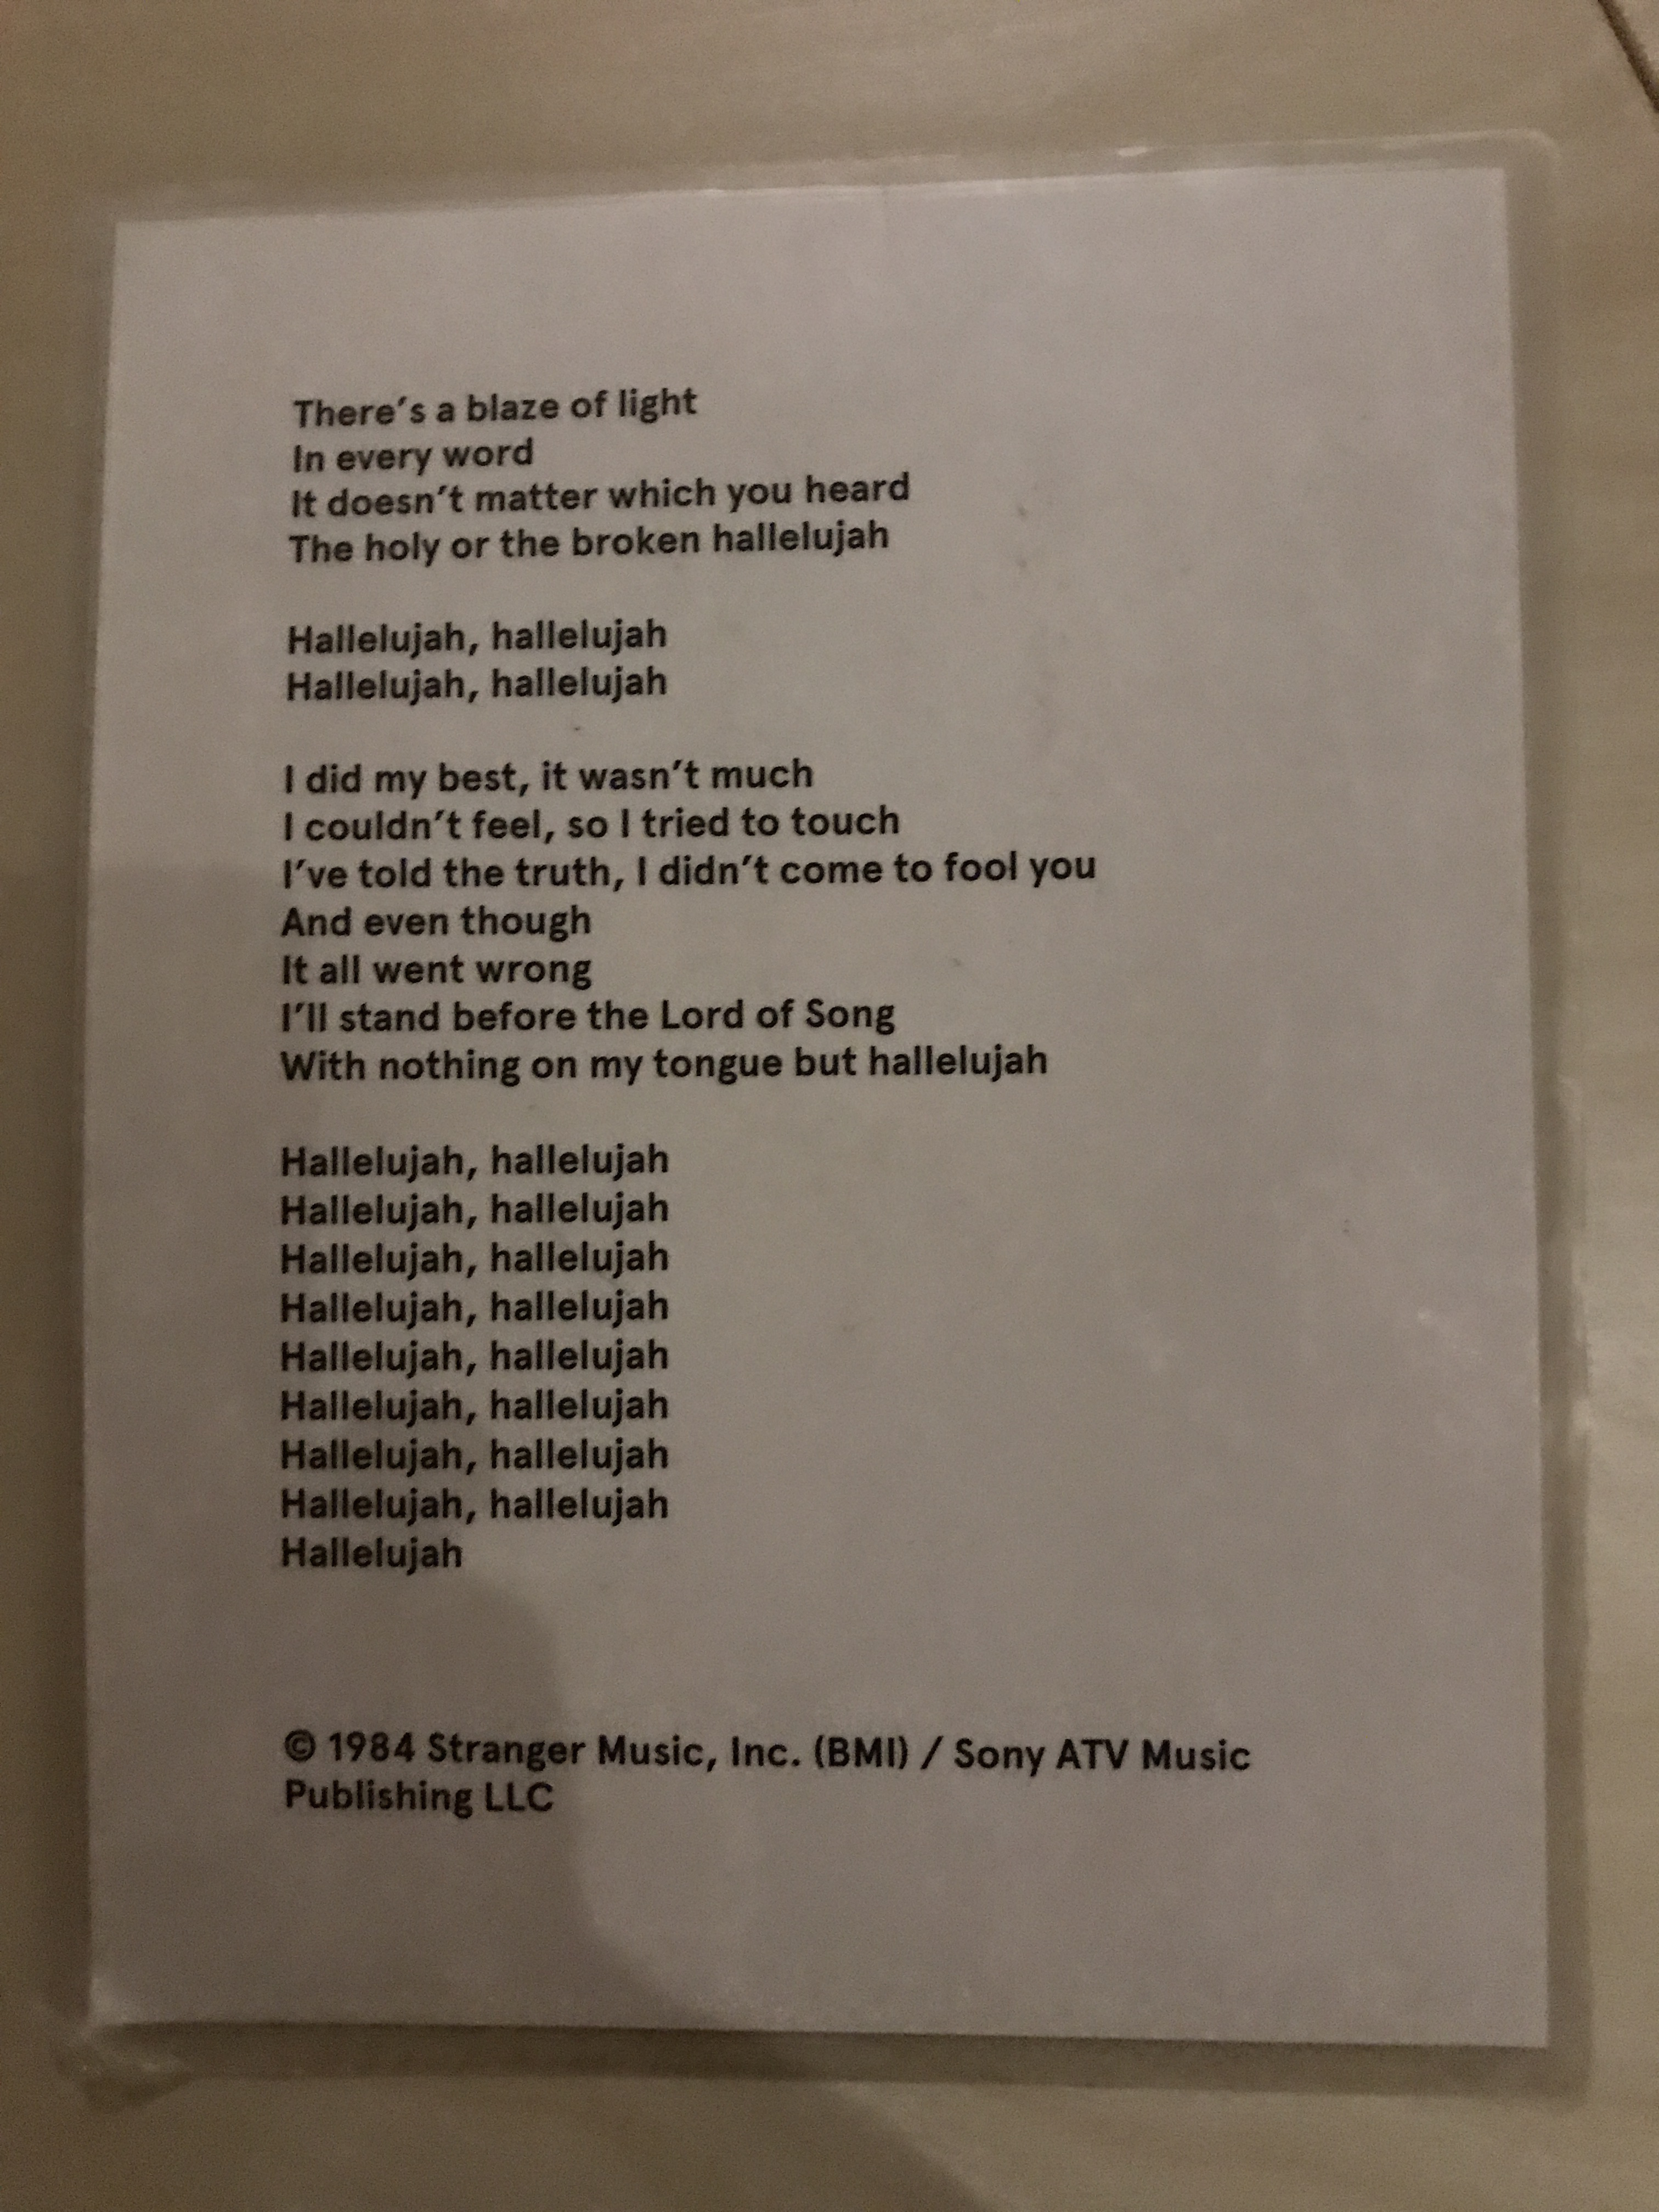 Leonard Cohen exhibit (lyrics to Hallelujah p. 2)